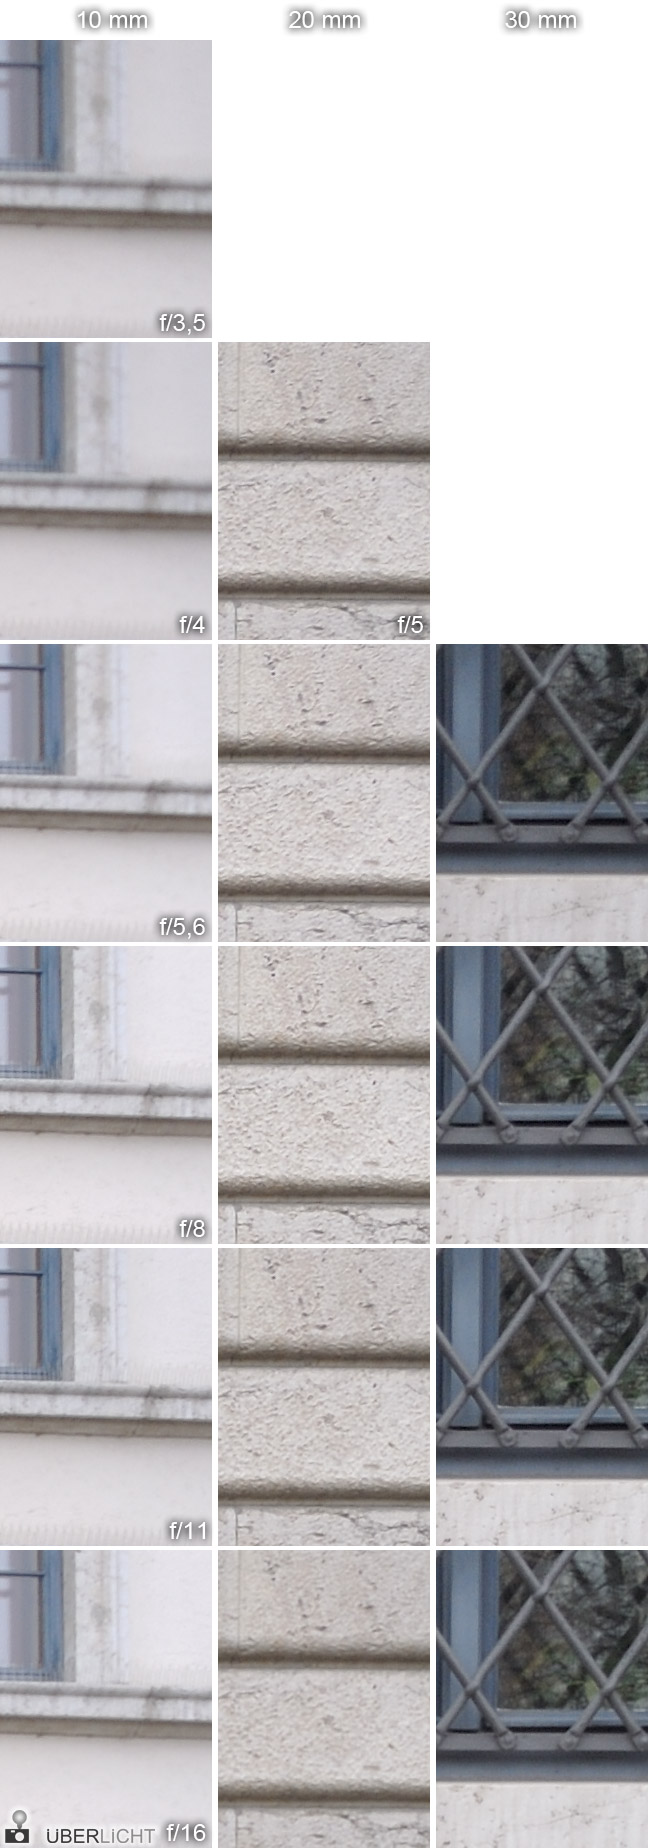 Nikon 1 10-30 VR Nikkor V1 Kit-Zoom Vergleich Randschaerfe